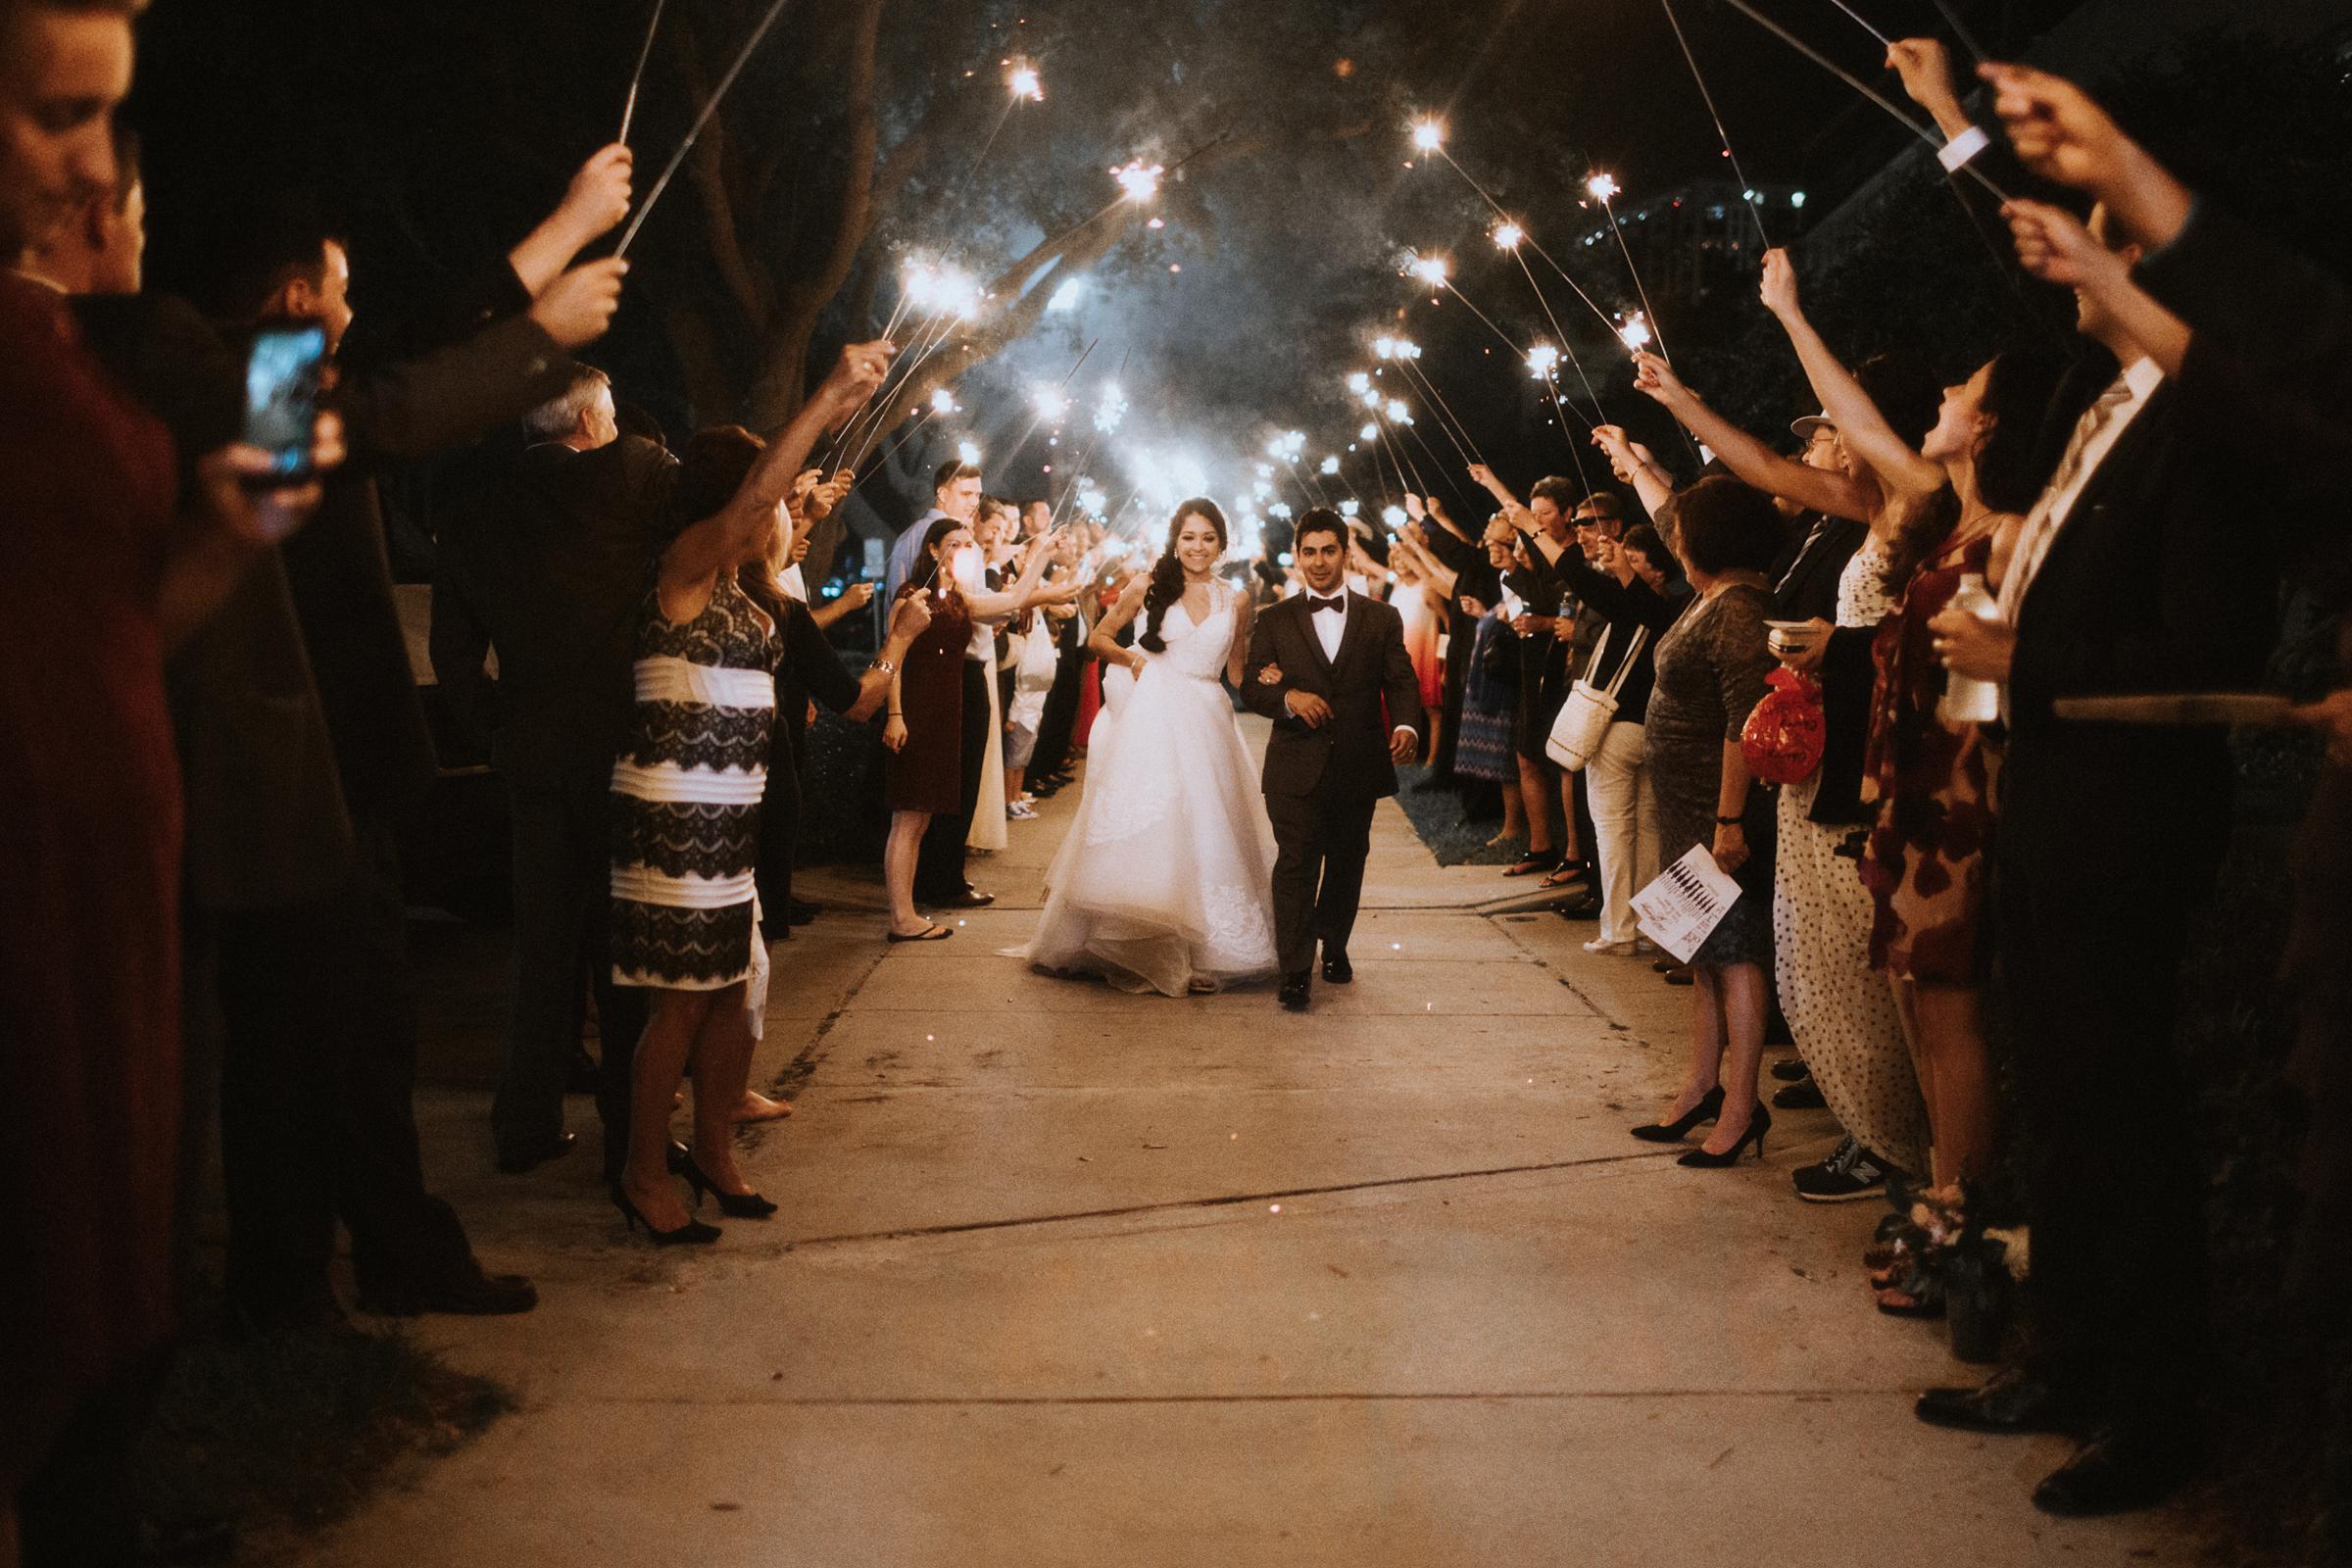 wedding day | MFA St Pete | Vanessa Boy Photography | vanessaboy.com-768.com |final.jpg